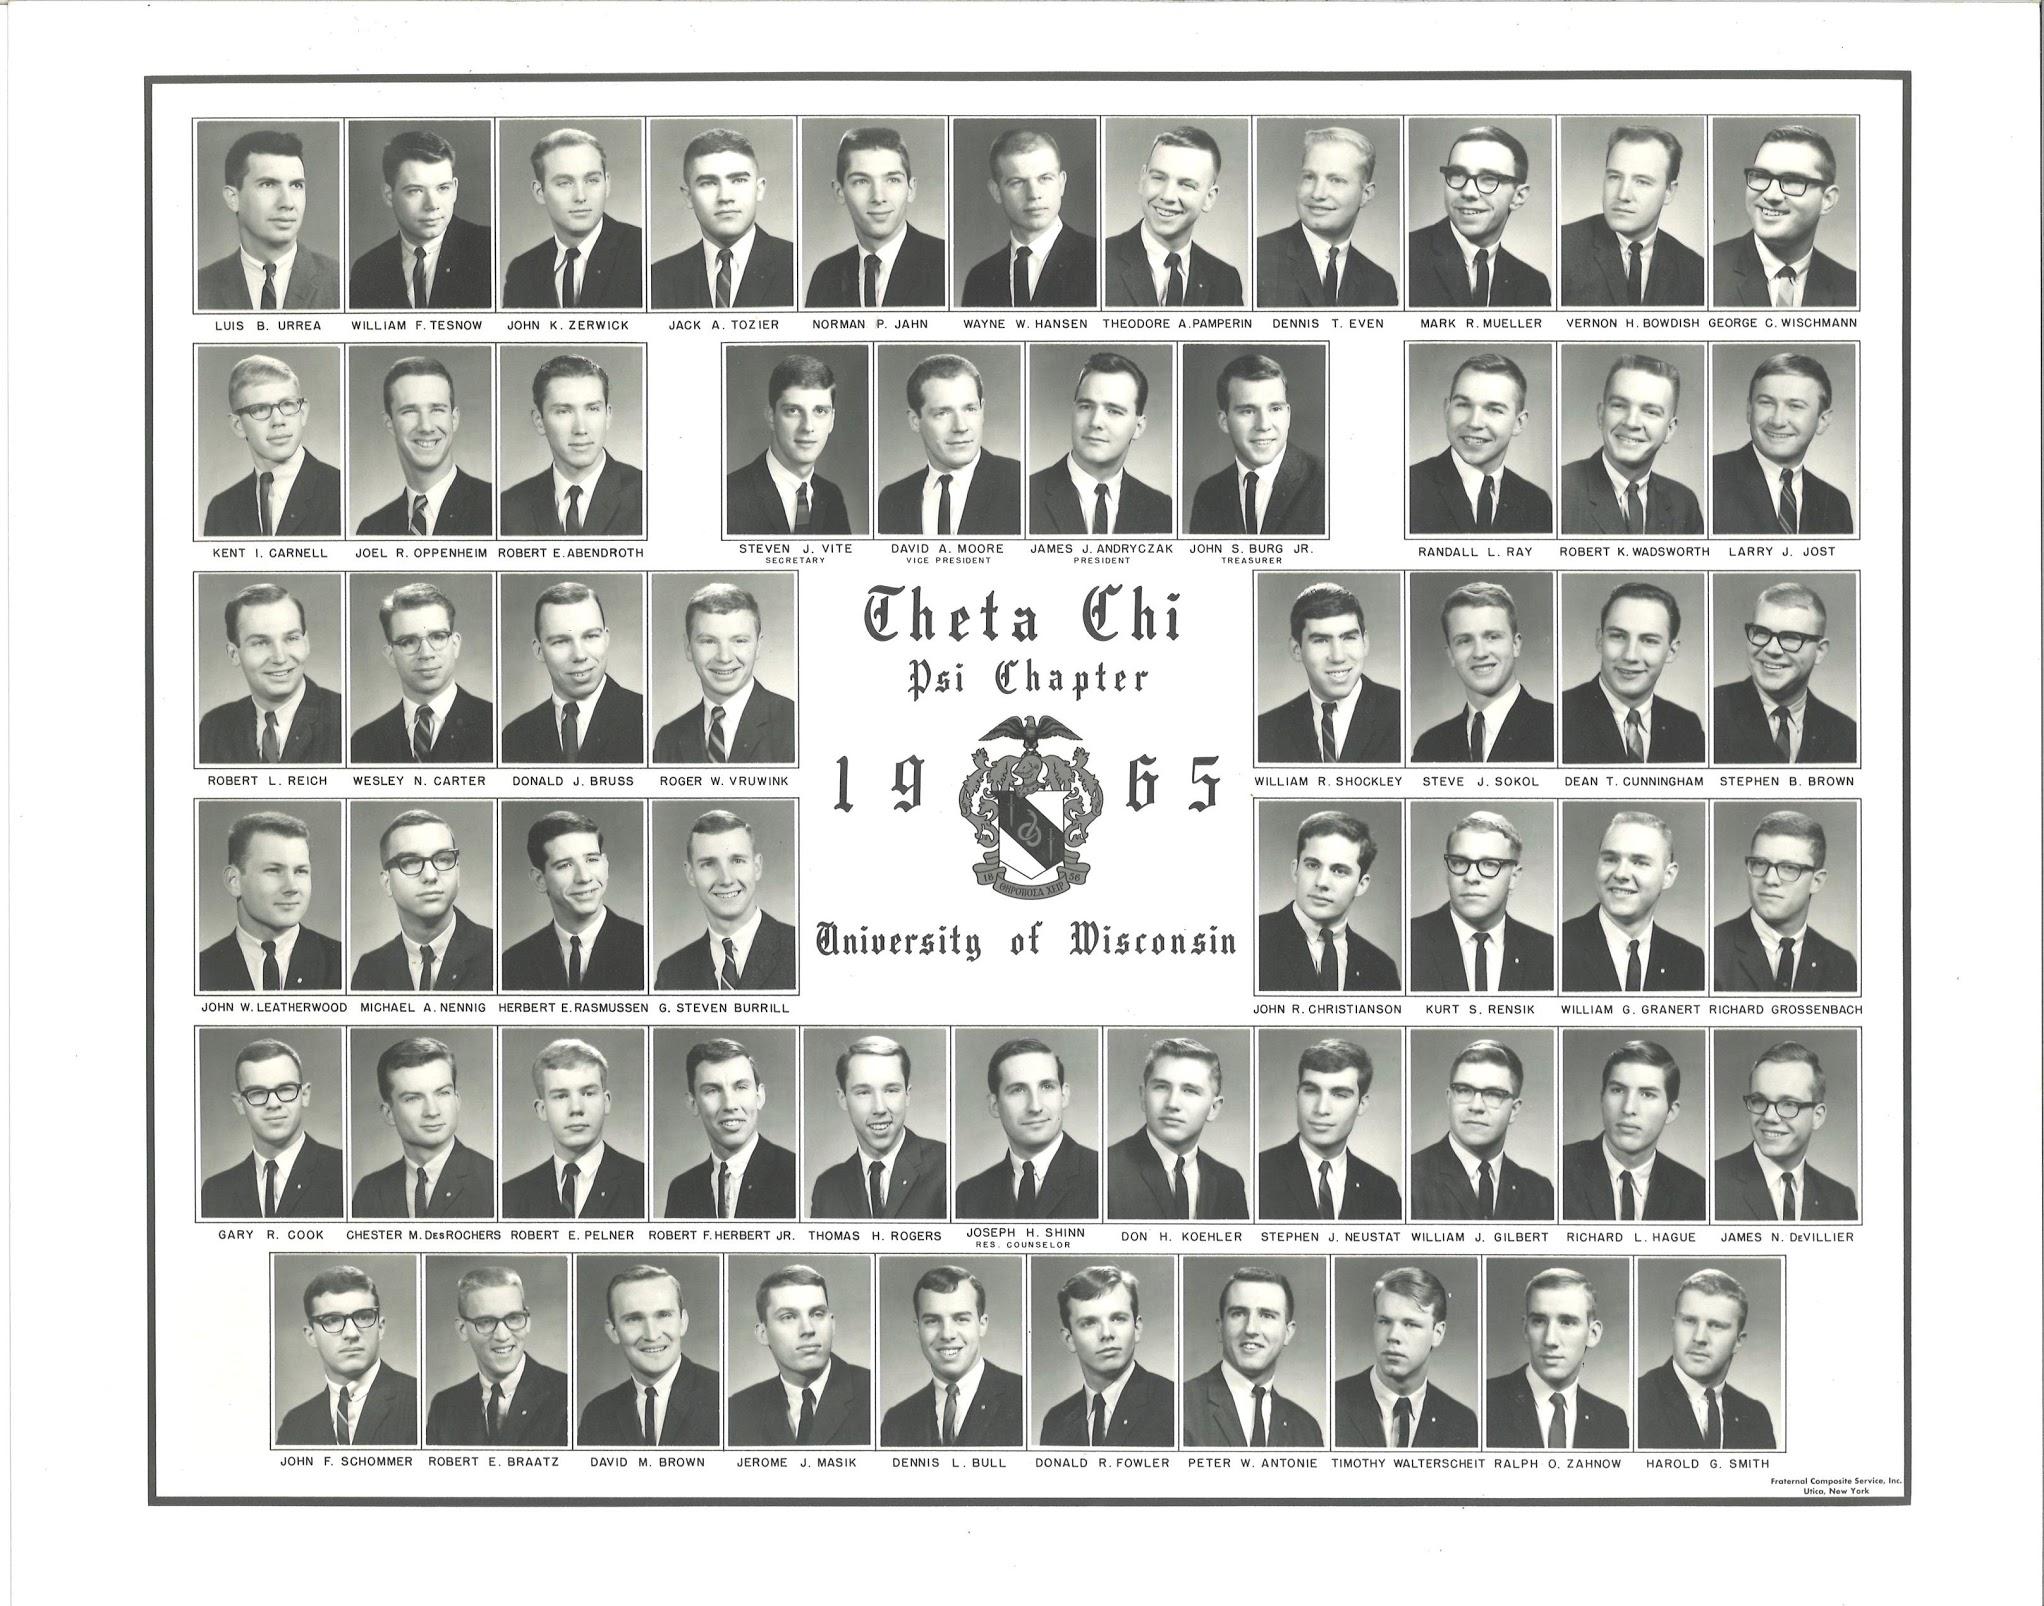 1965 Composite